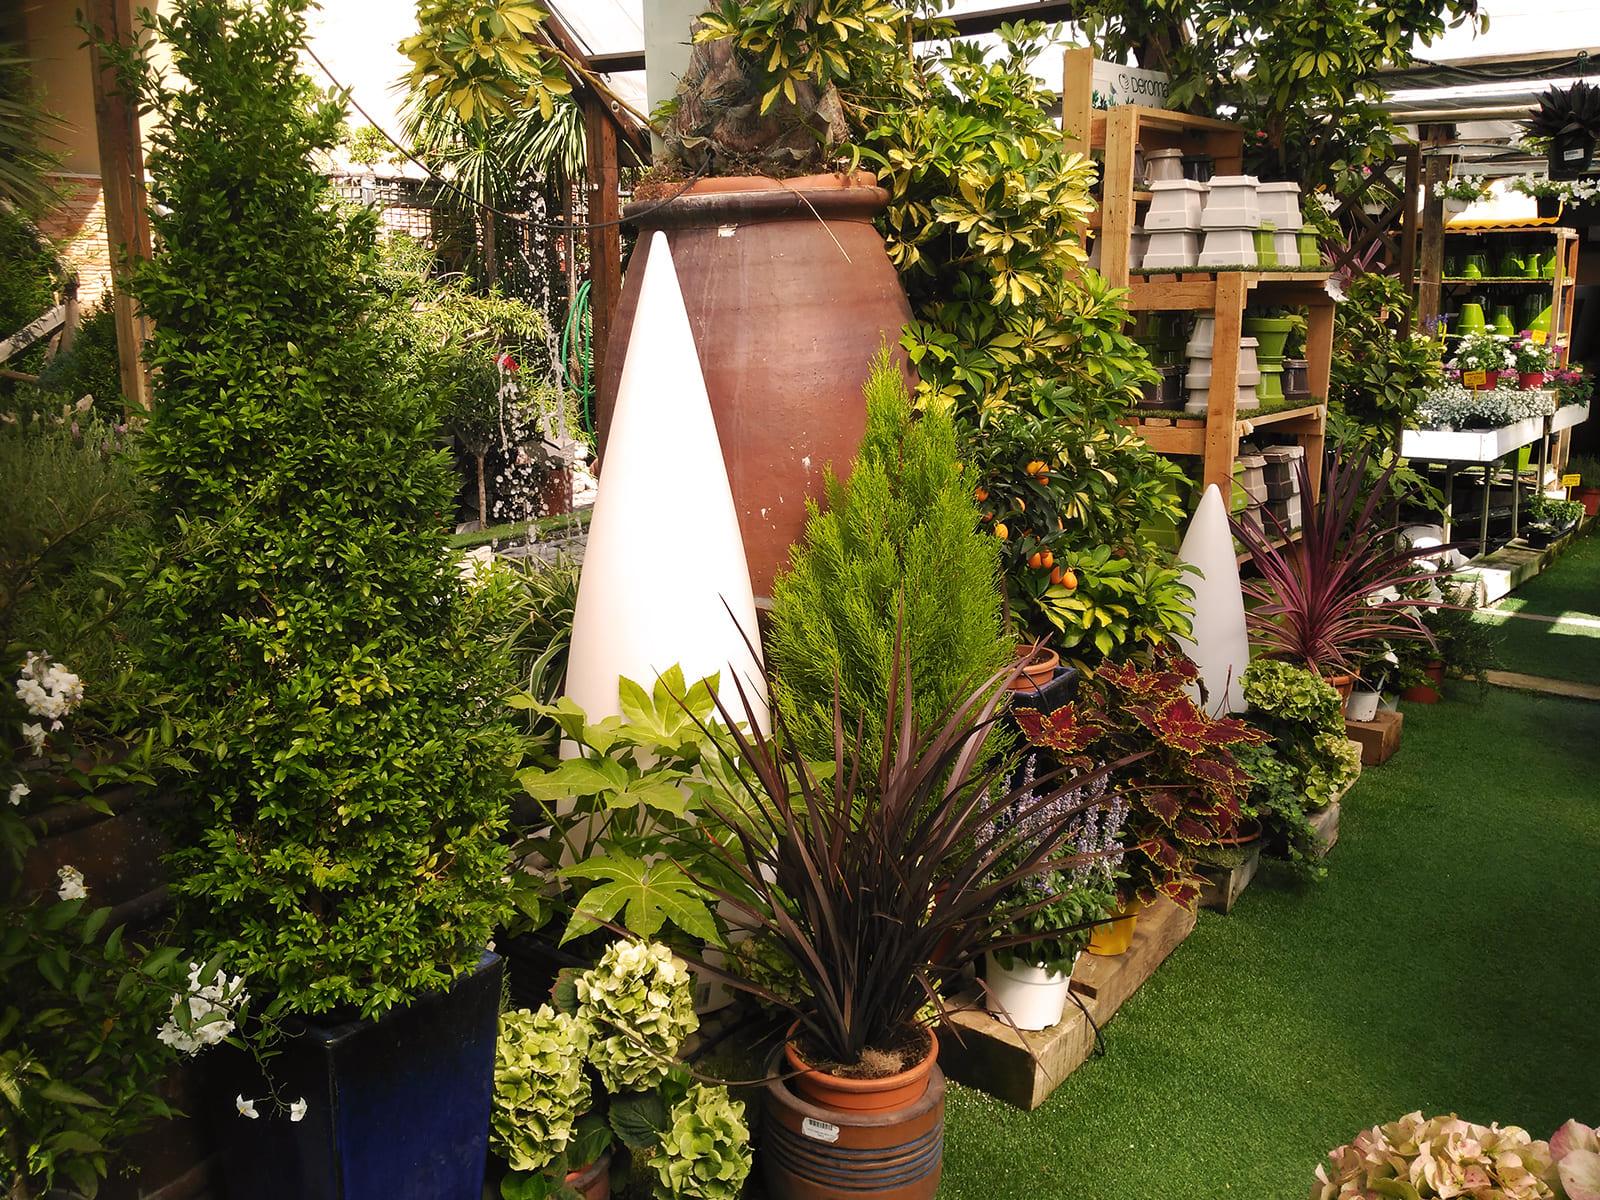 centro-jardineria-garden-invernadero-artesanal-madera-fuente-06_HIDROJARDIN-Bañeres